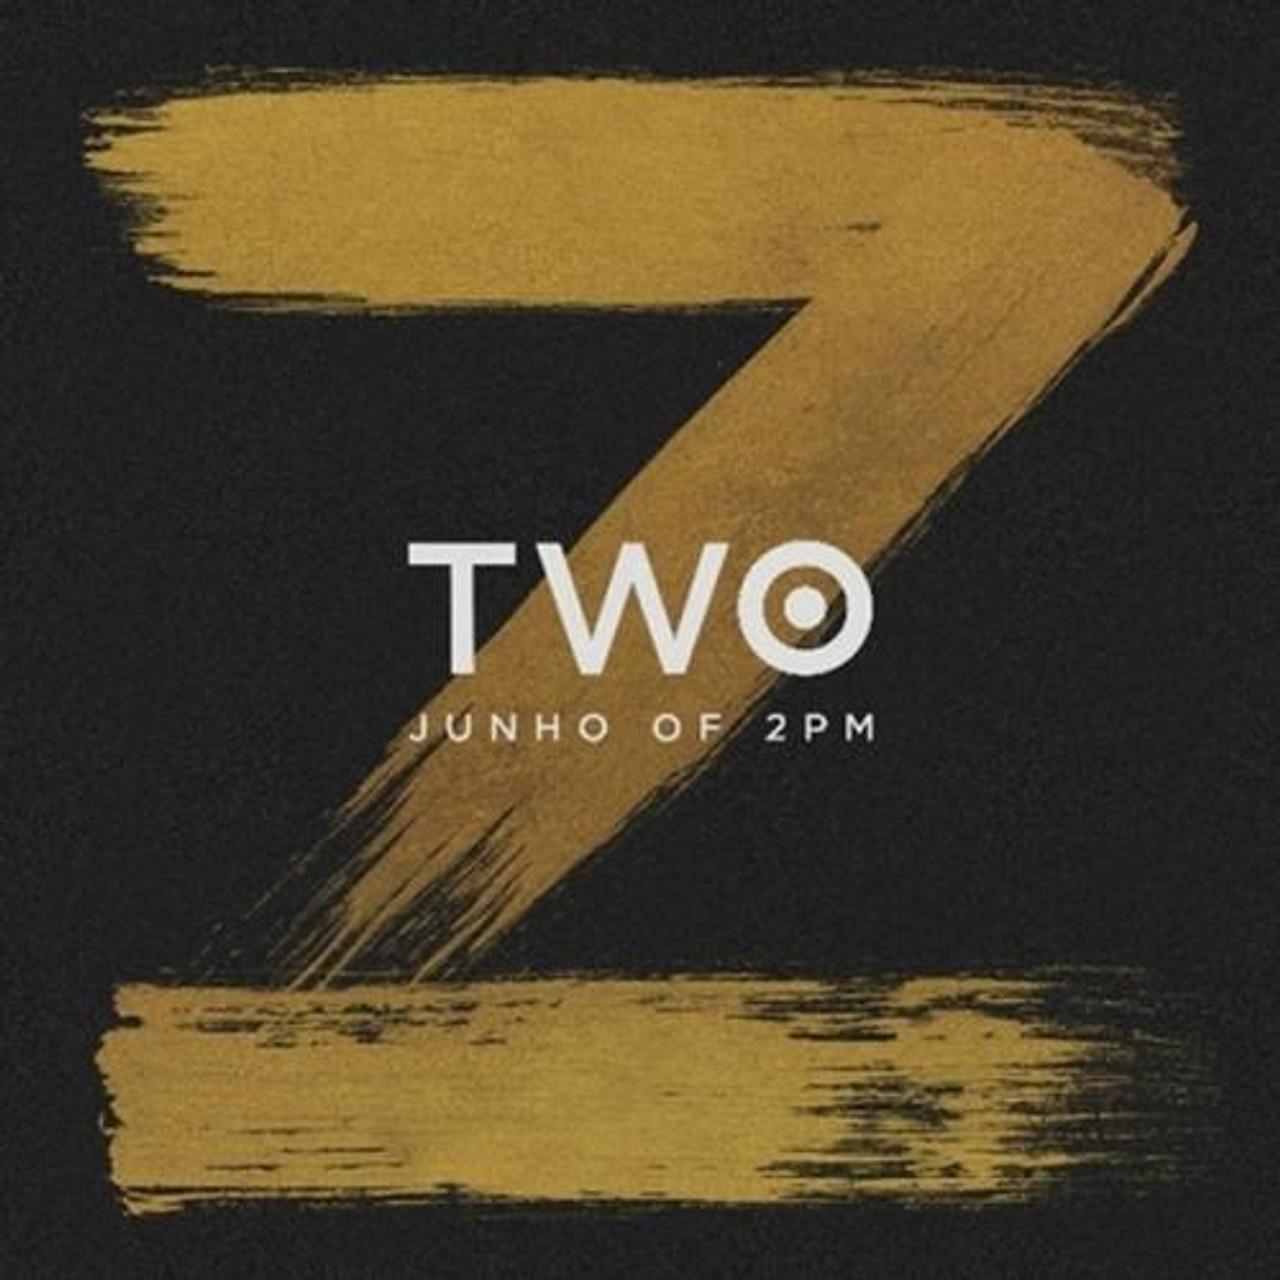 2PM JUNHO - [TWO] + Poster (1CD, 1DVD)